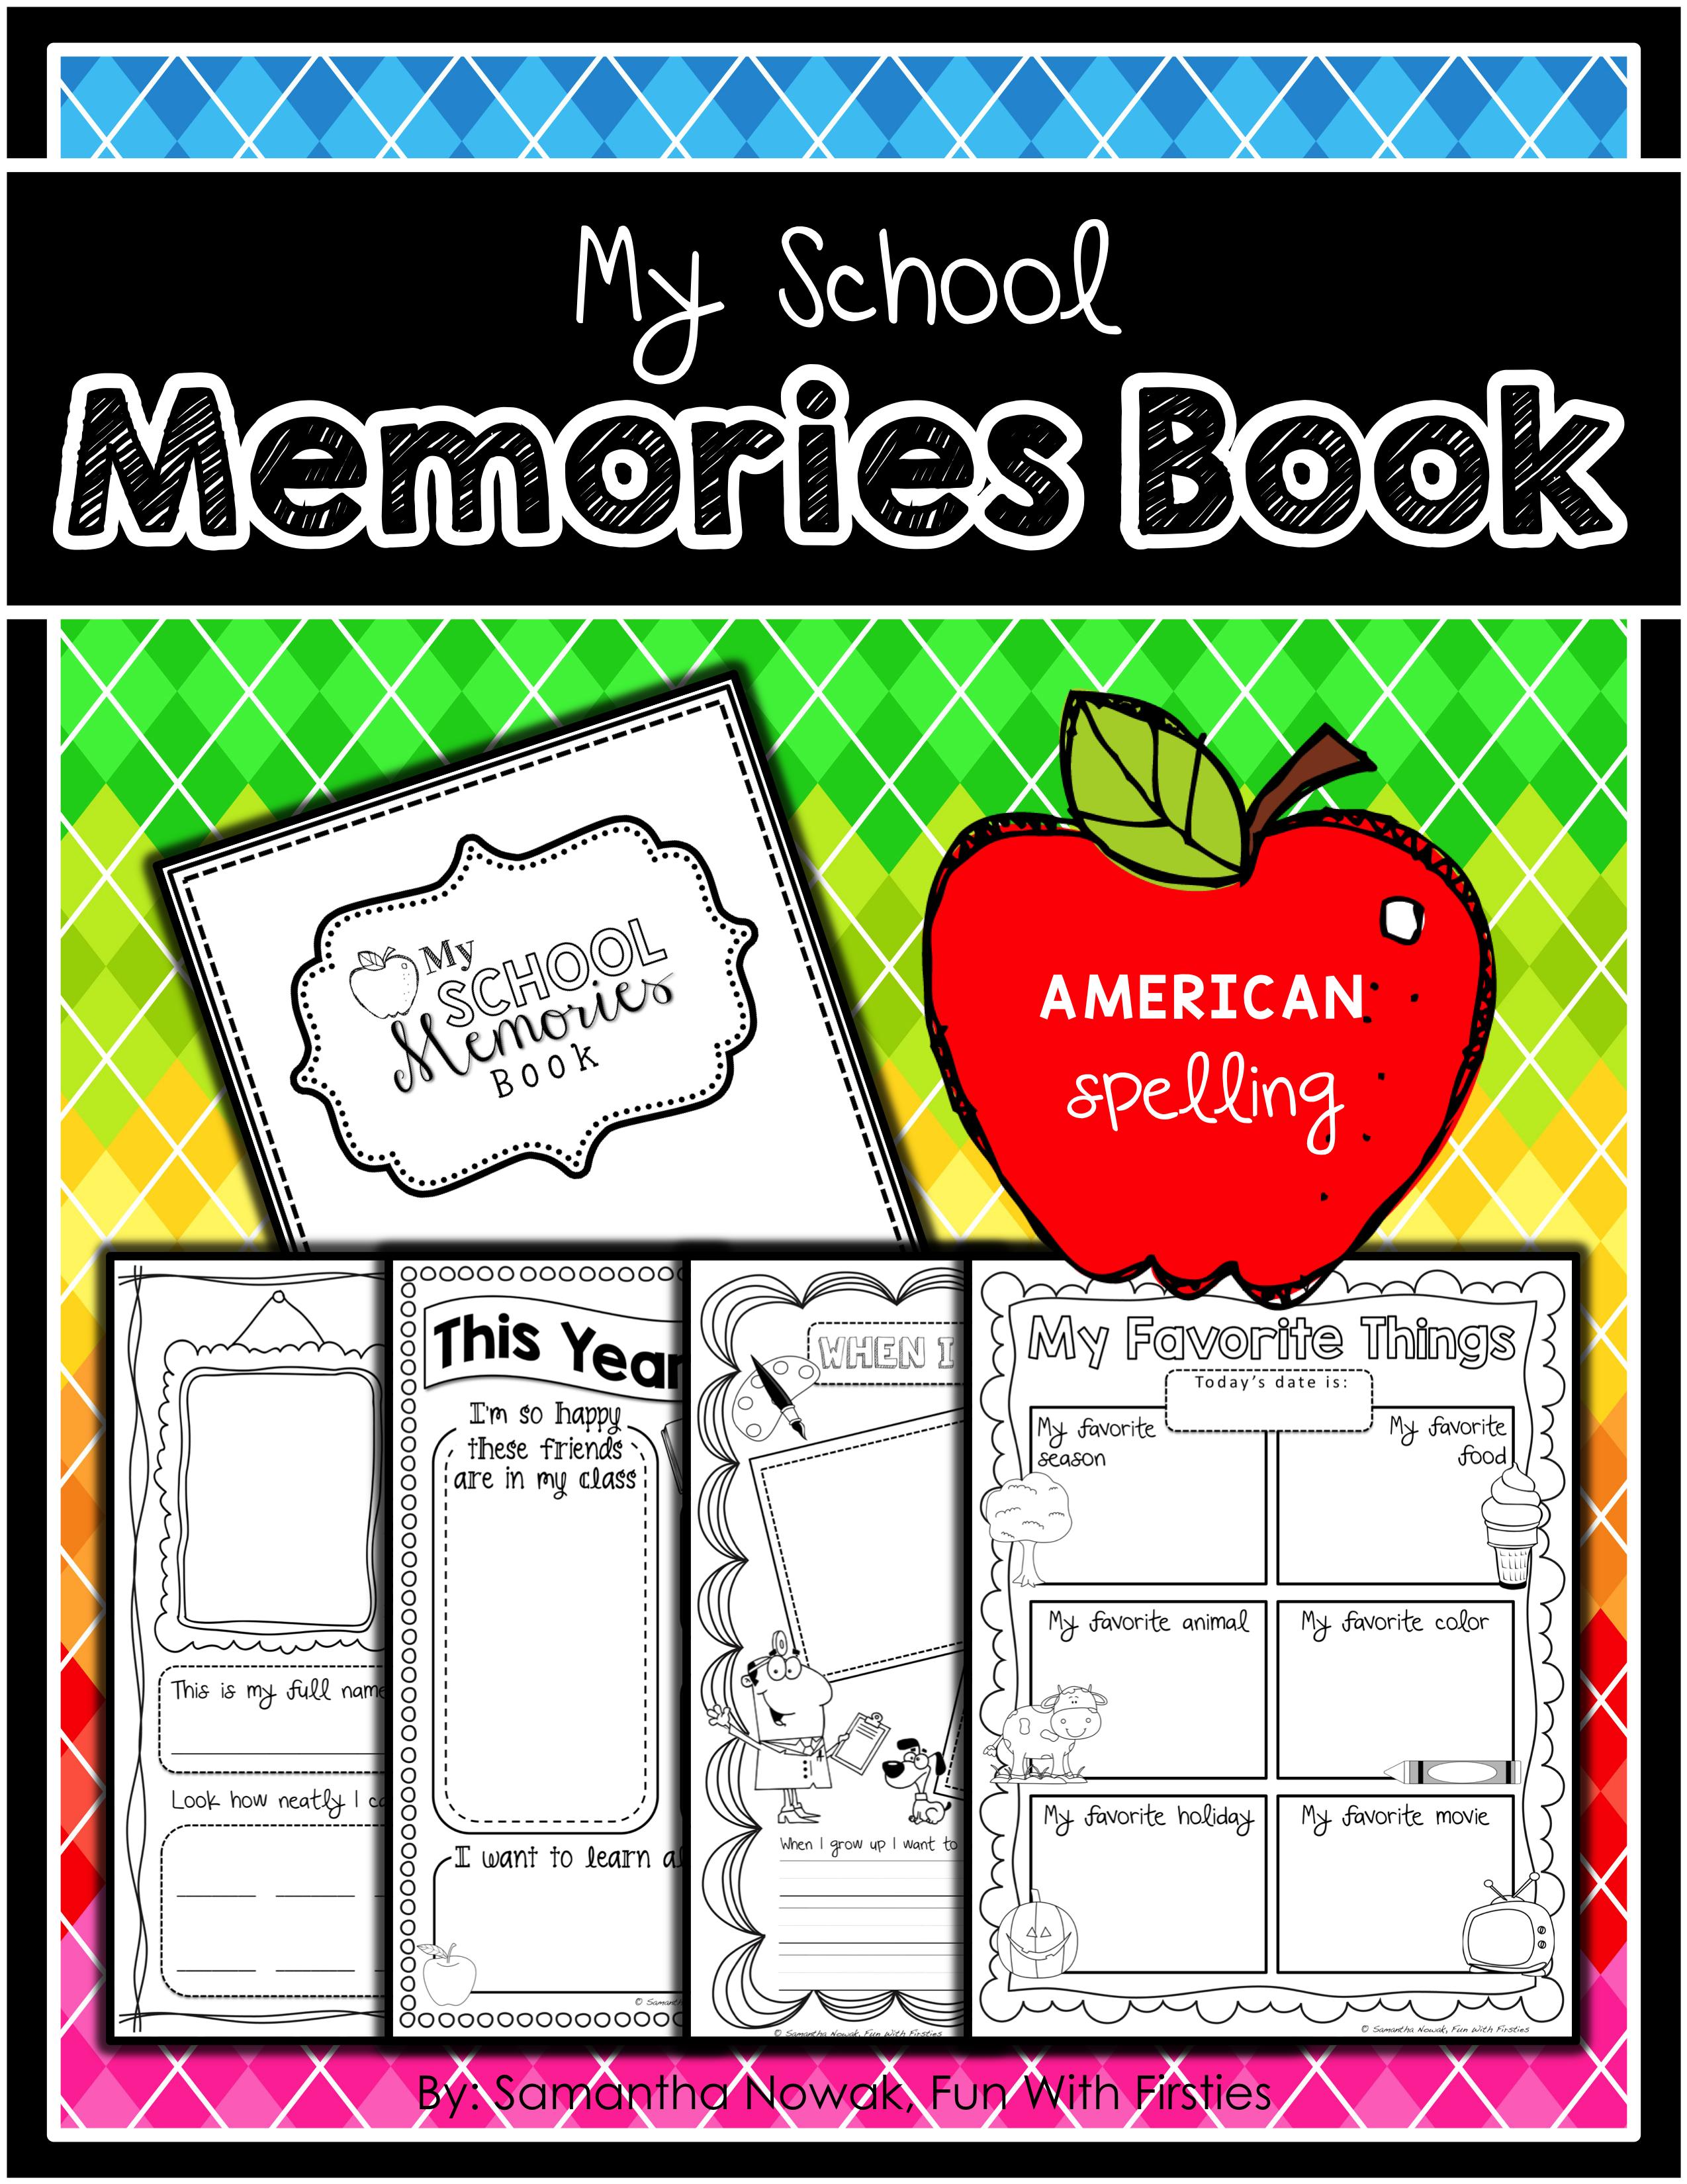 My School Memory Book Documenting School Memories And